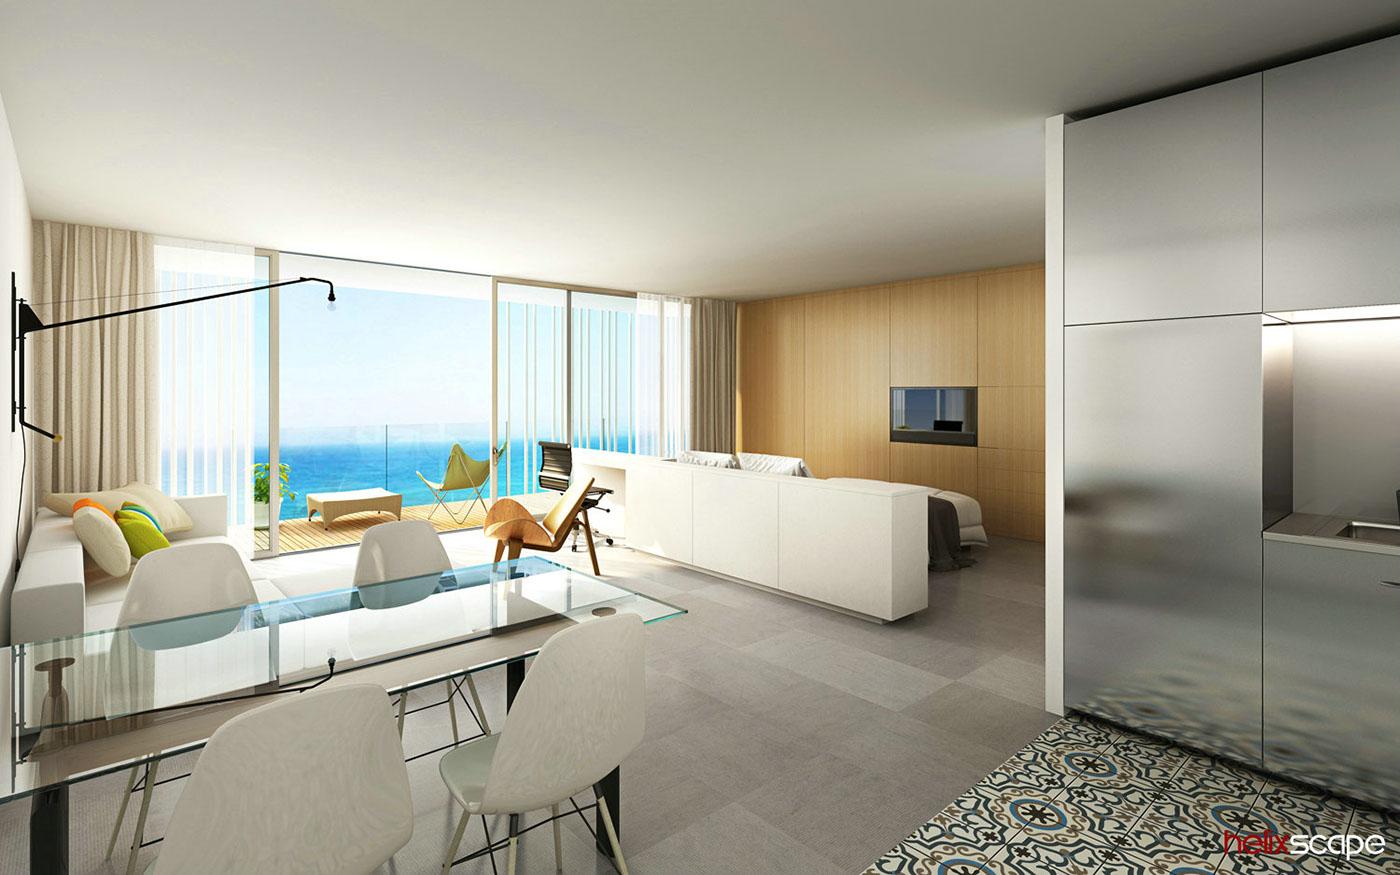 architectural visualization 3D Rendering Interior hotel architecture